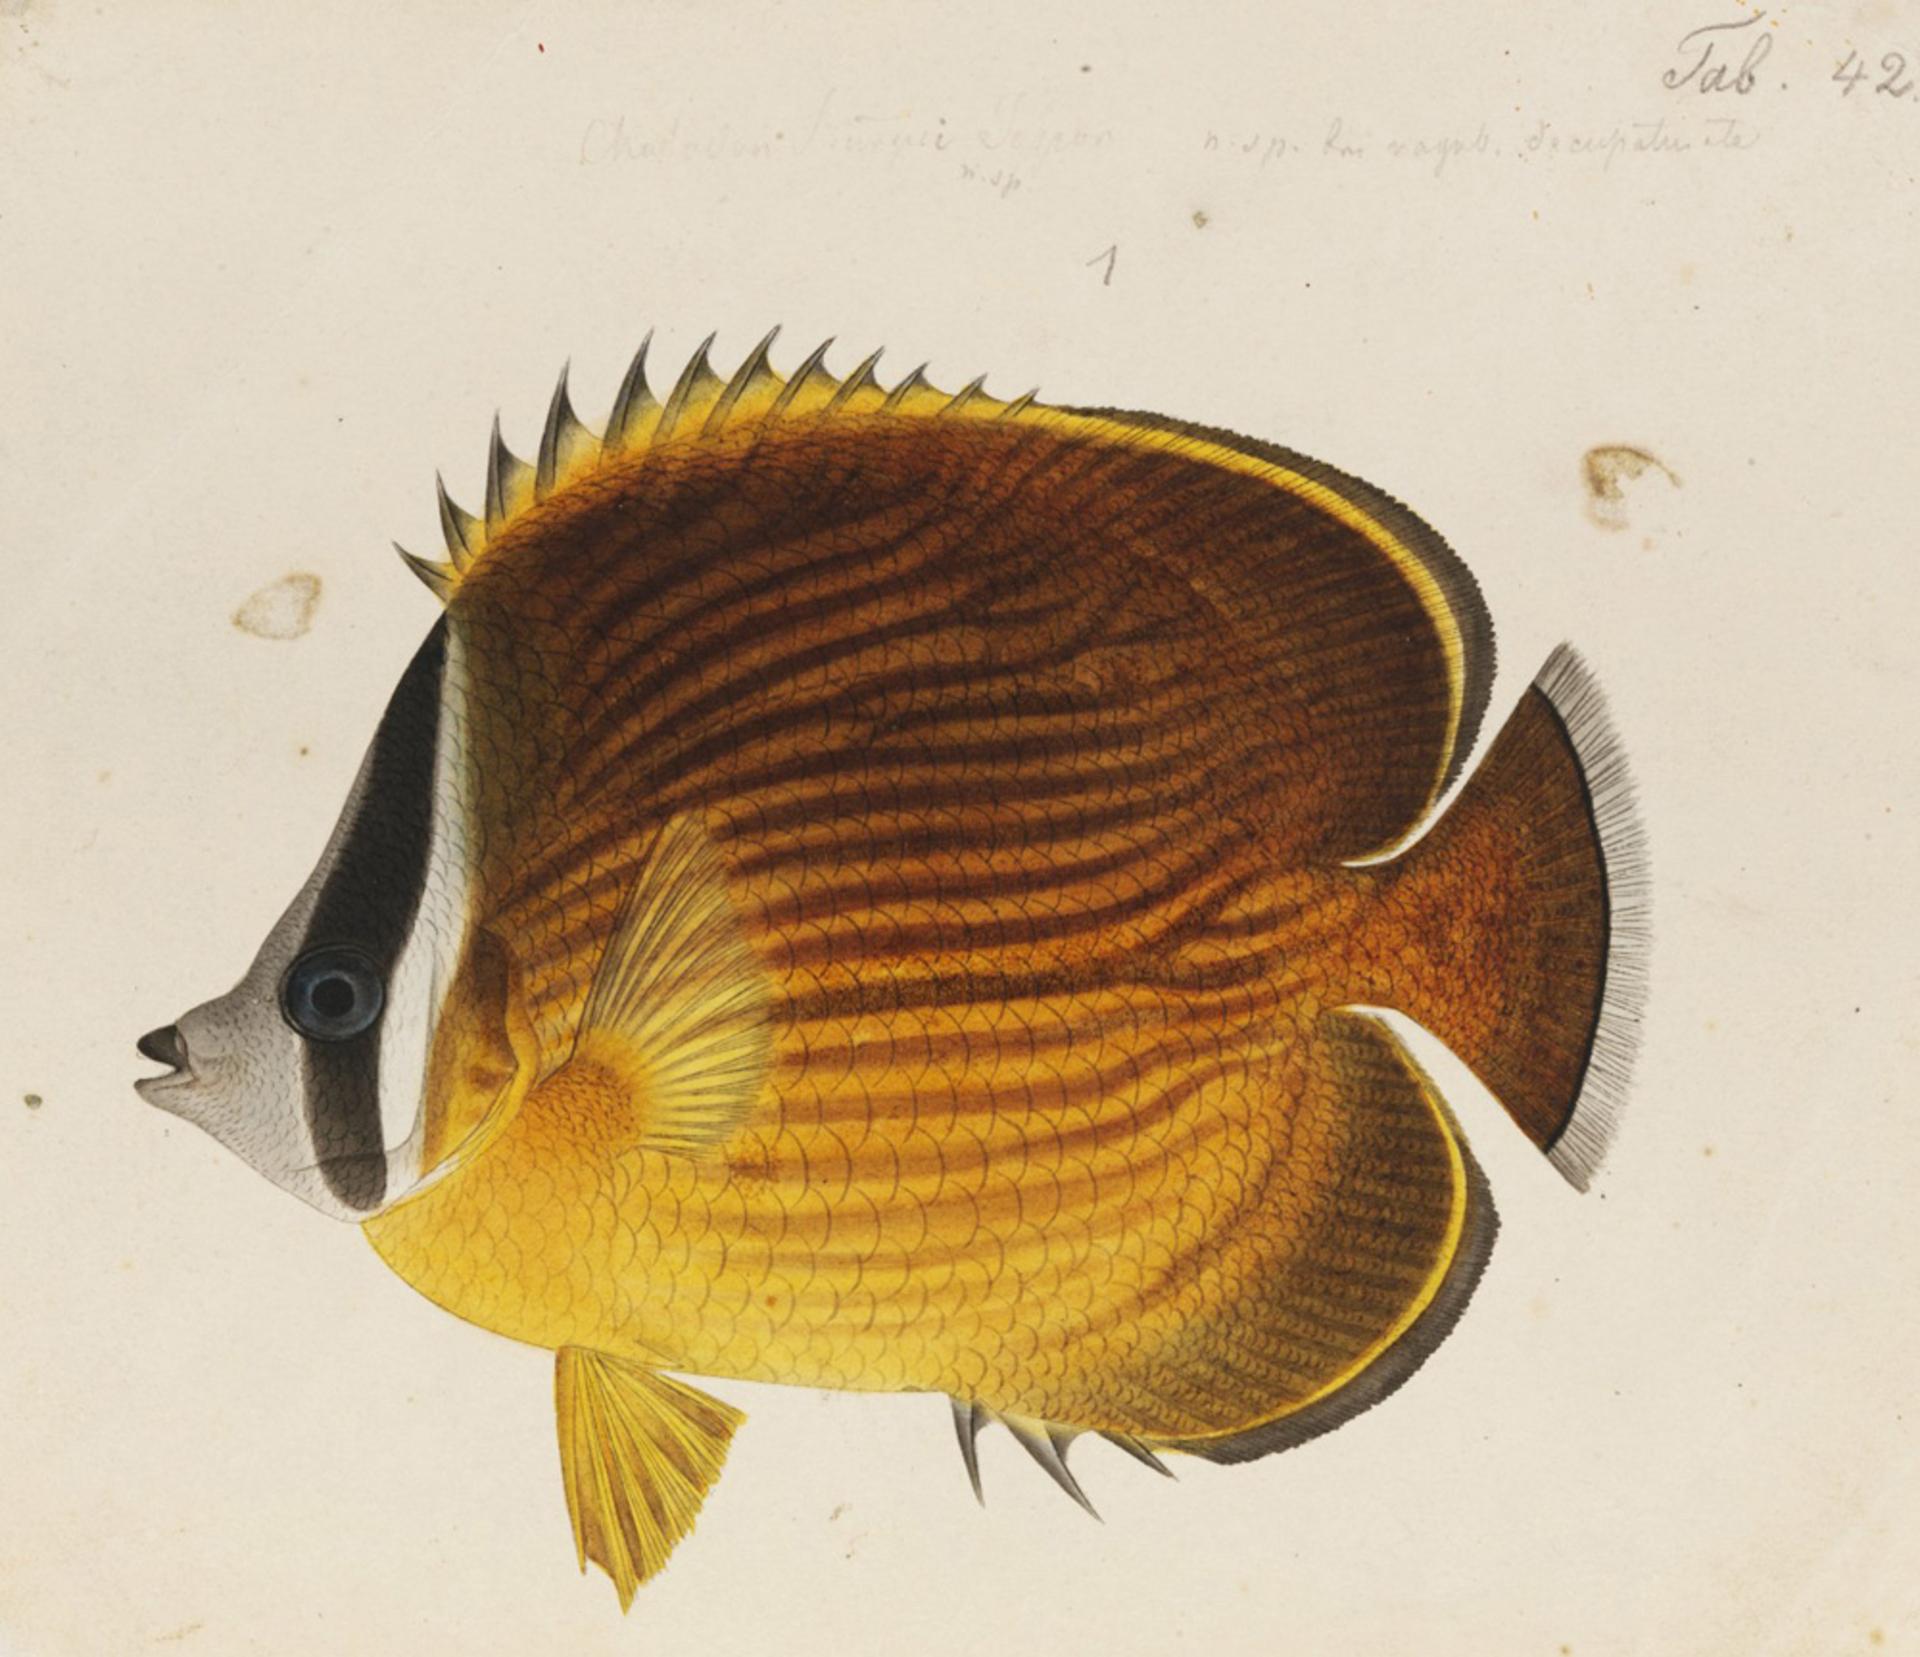 RMNH.ART.489   Chaetodon collare Bloch